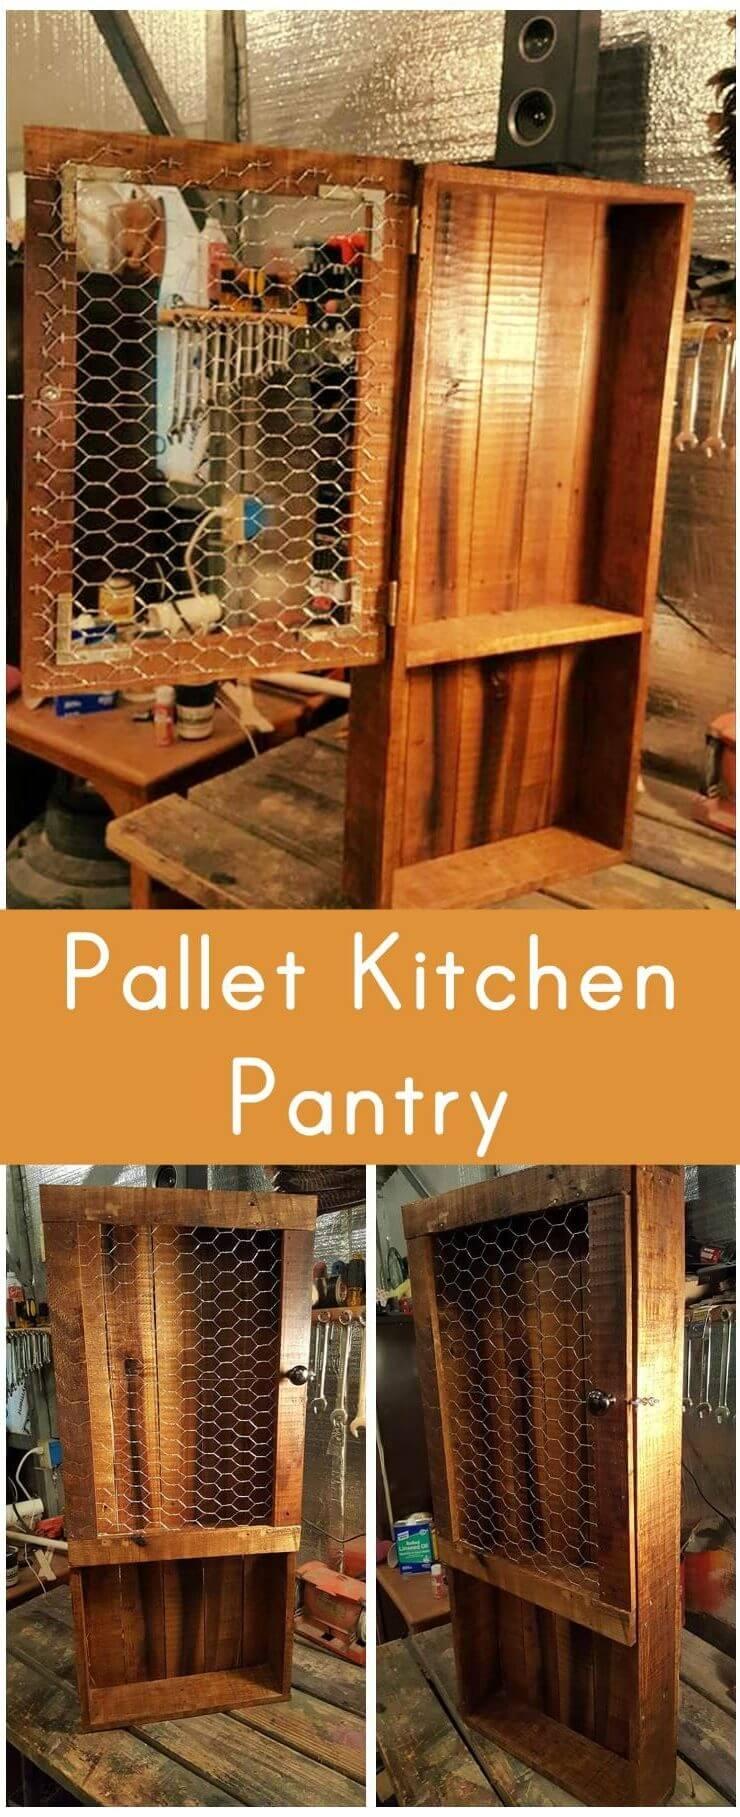 Pallet Kitchen Pantry